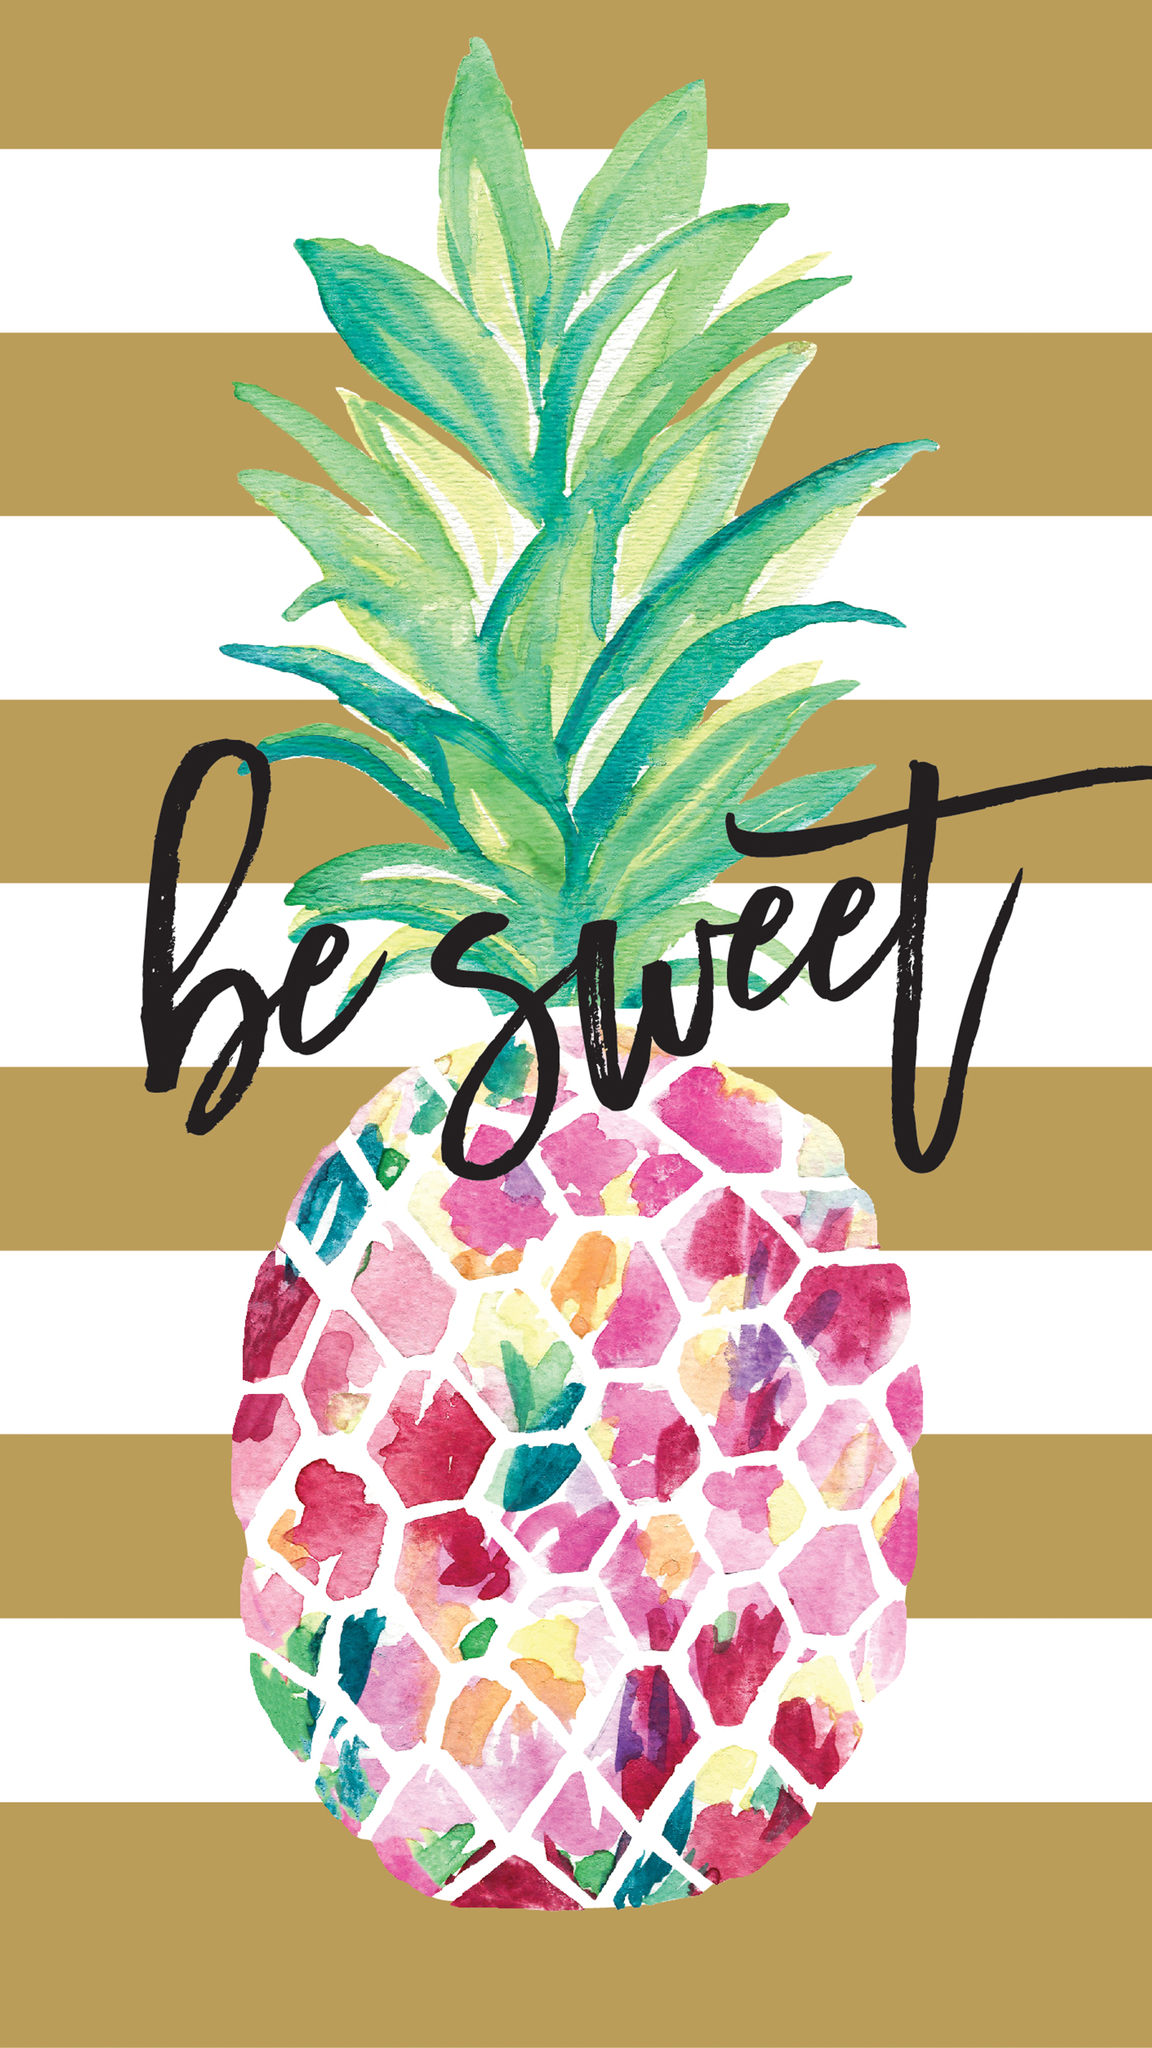 Obshij Dostup Predostavlen Cherez Dropbox Pineapple Wallpaper Wallpaper Iphone Summer Iphone Wallpaper